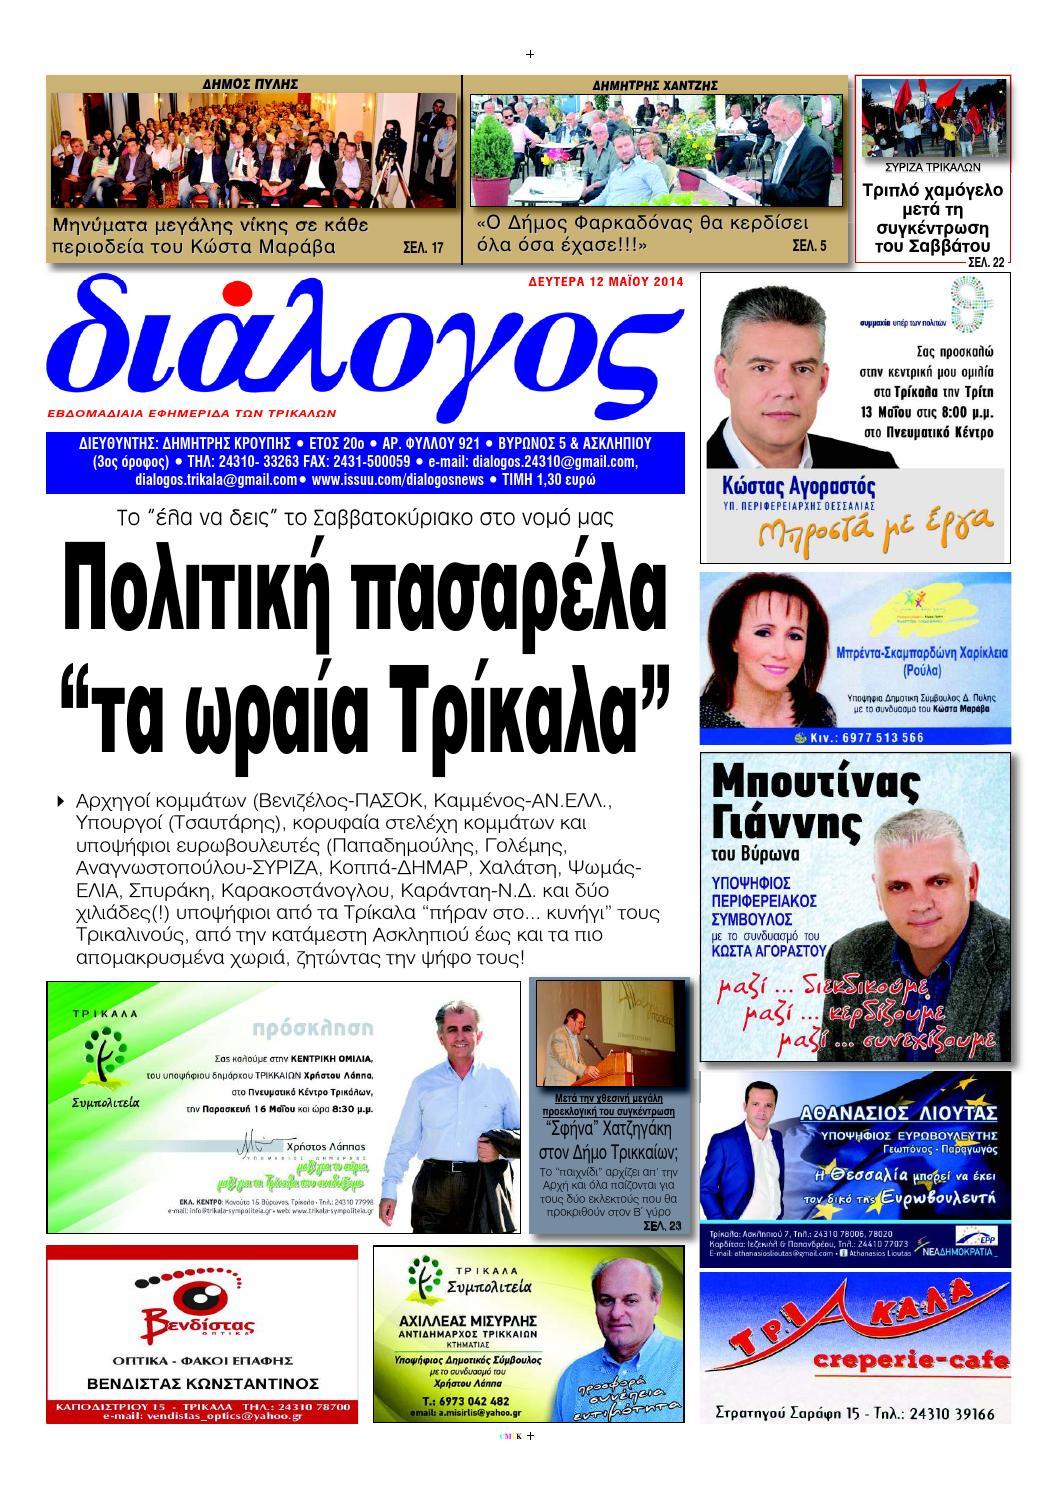 12-05-2014 by διάλογος (dialogos) - issuu e1f03b6e103